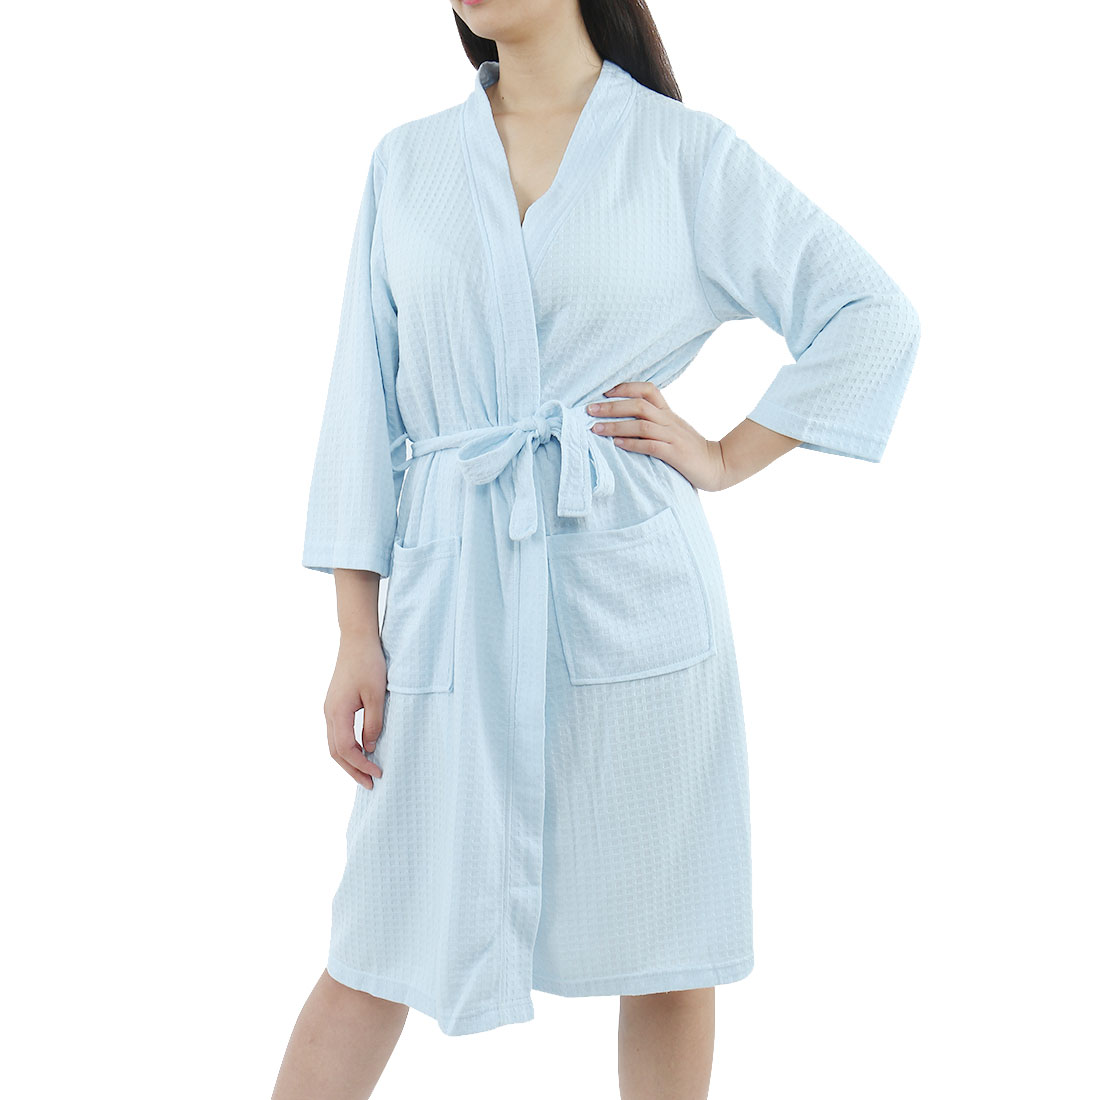 Women's Turkish Cotton Lightweight Soft Warm Kimono Short Robe M Blue